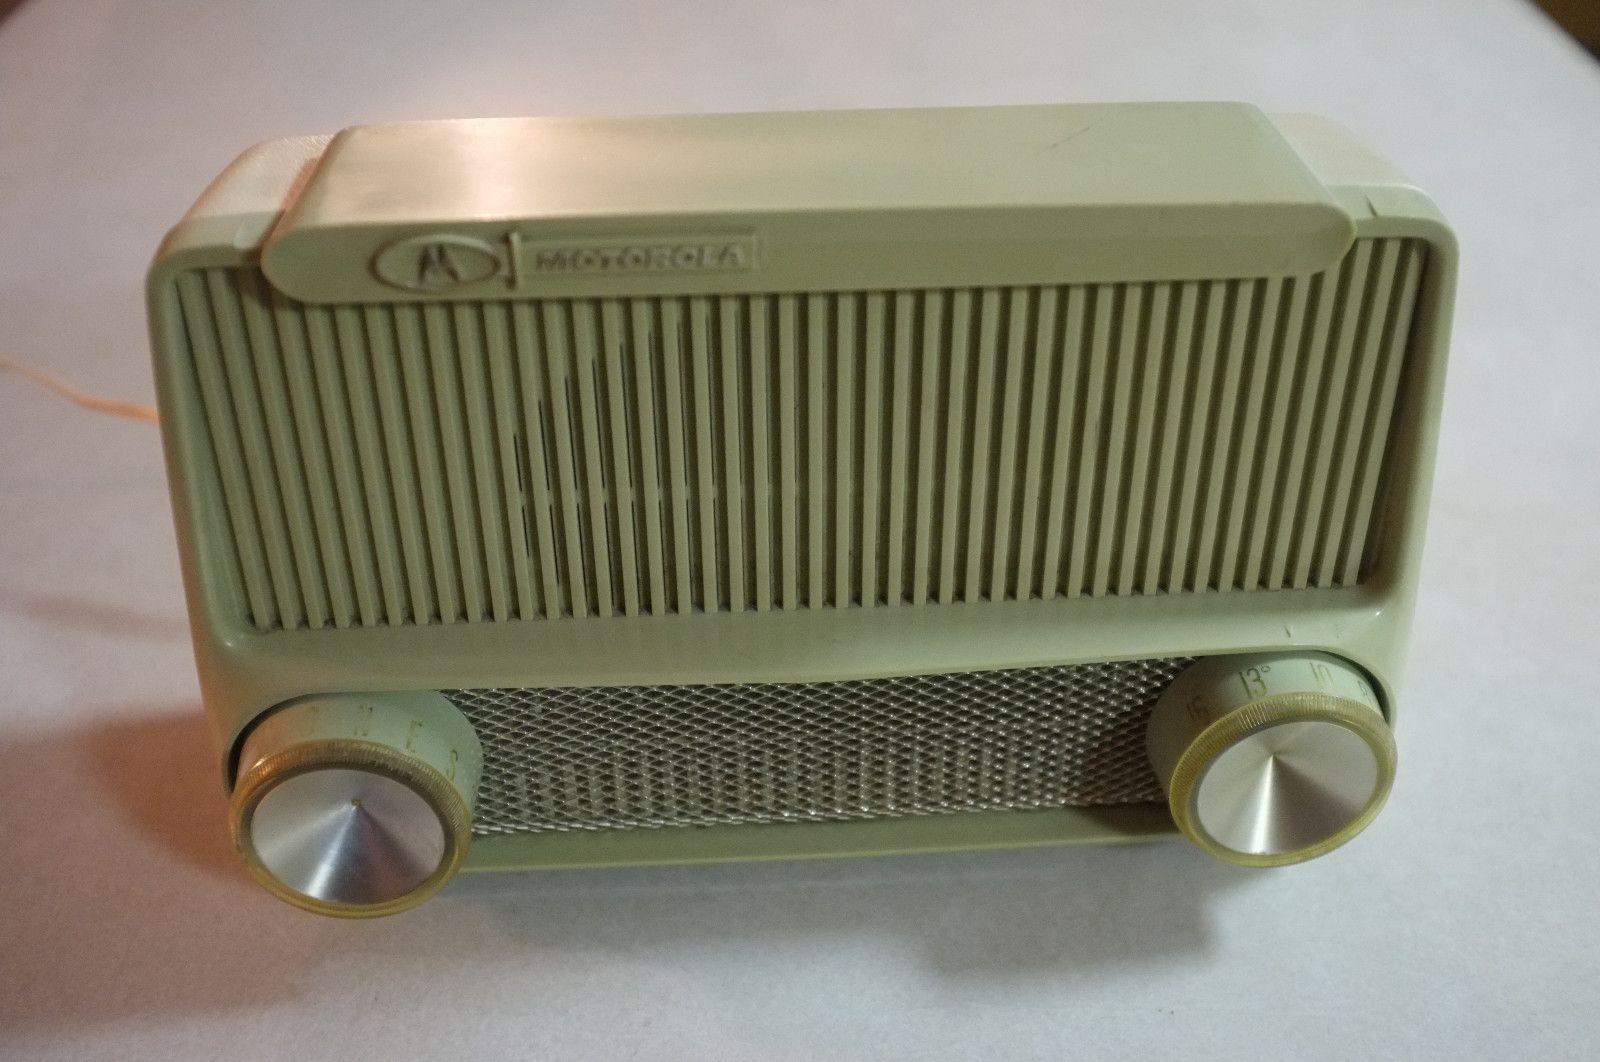 Grundig 3066 Vintage German Tube Radio 1959 Valve Receiver Ebay Vintage Radio Retro Radios Antique Radio